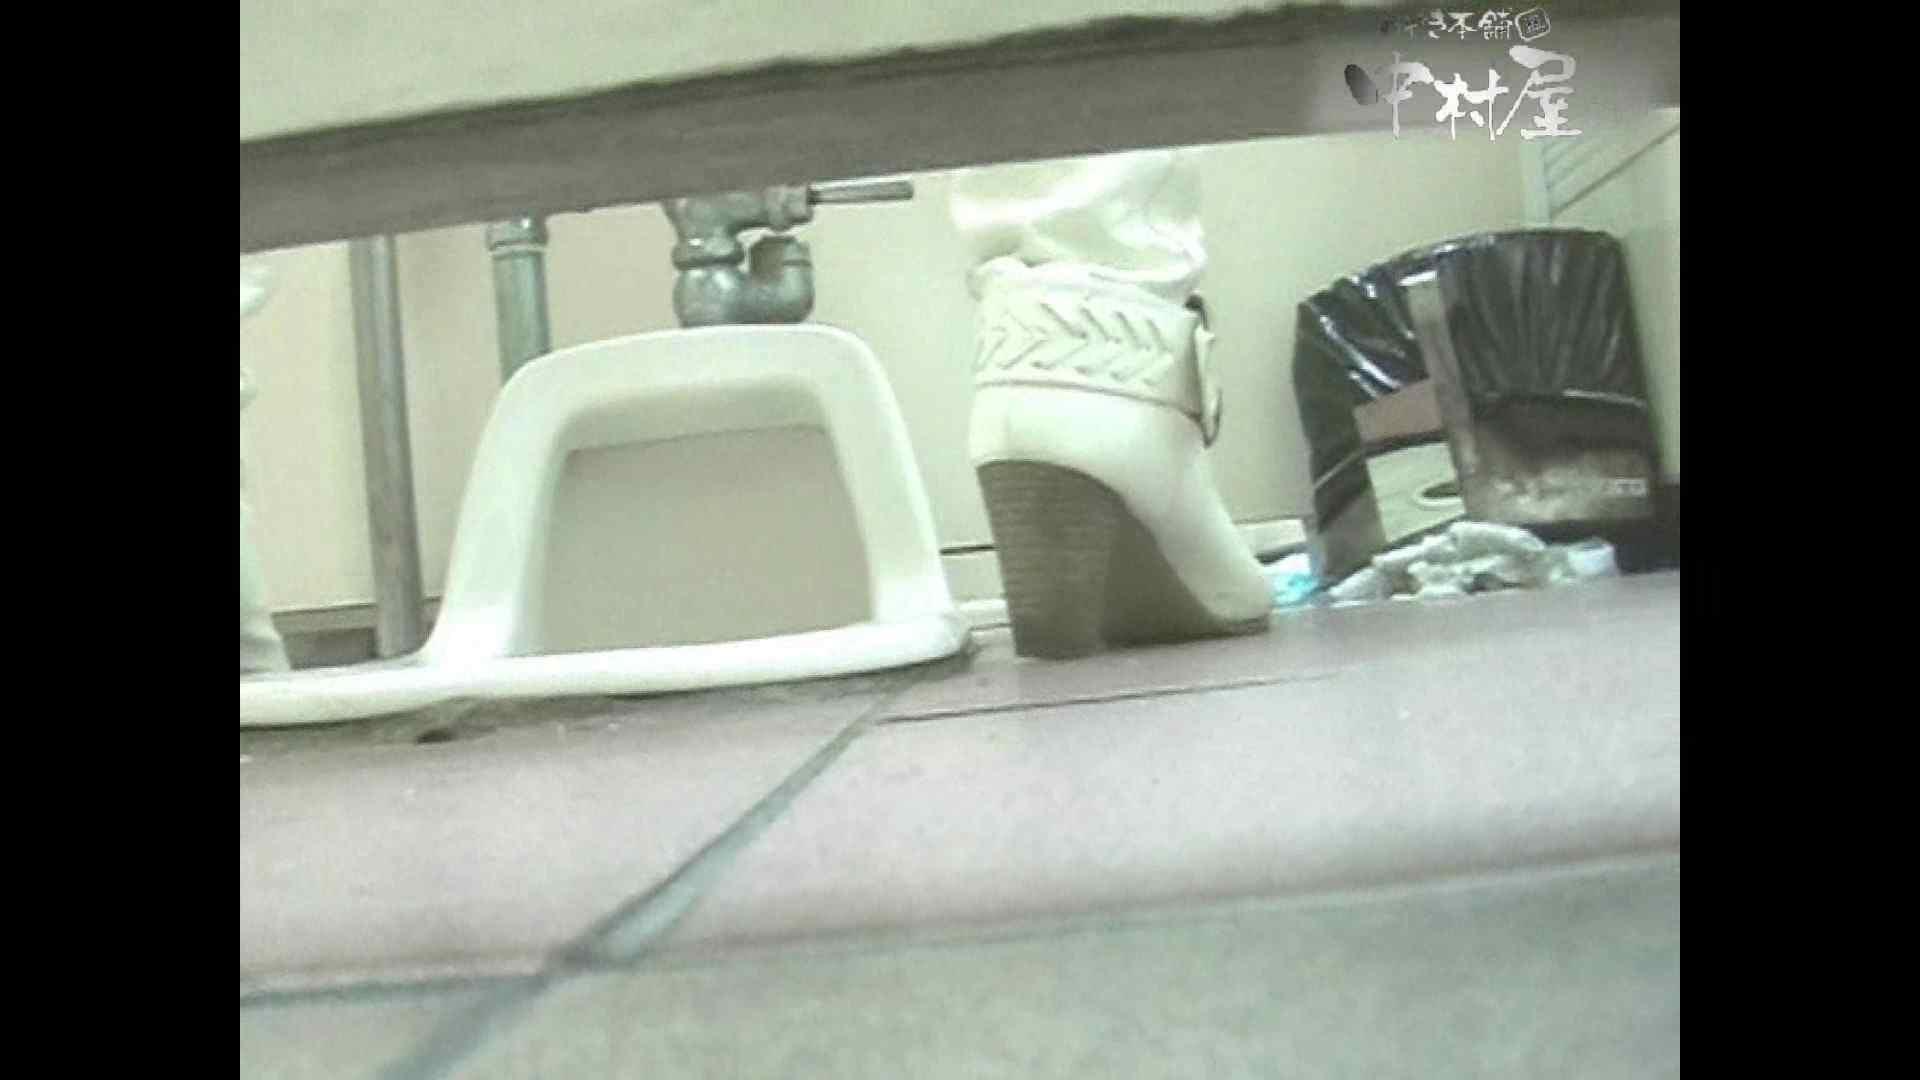 岩手県在住盗撮師盗撮記録vol.37 盗撮師作品 | 美しいOLの裸体  88pic 36